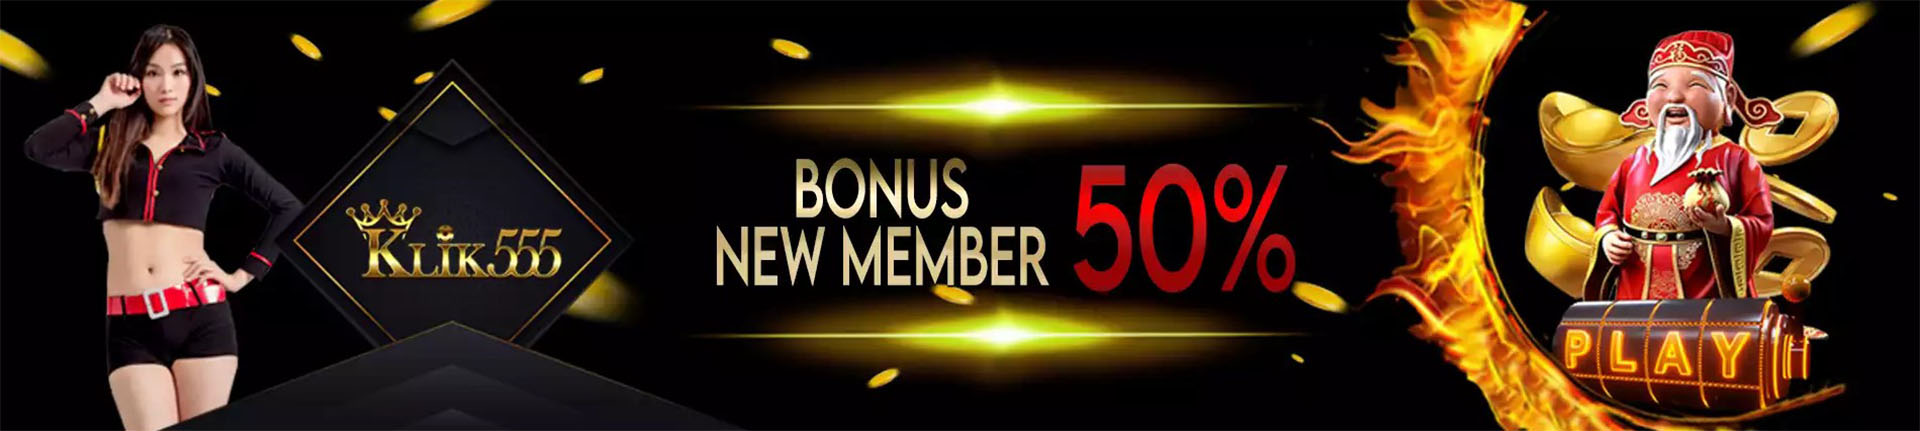 KLIK555 Bonus New Member 50%